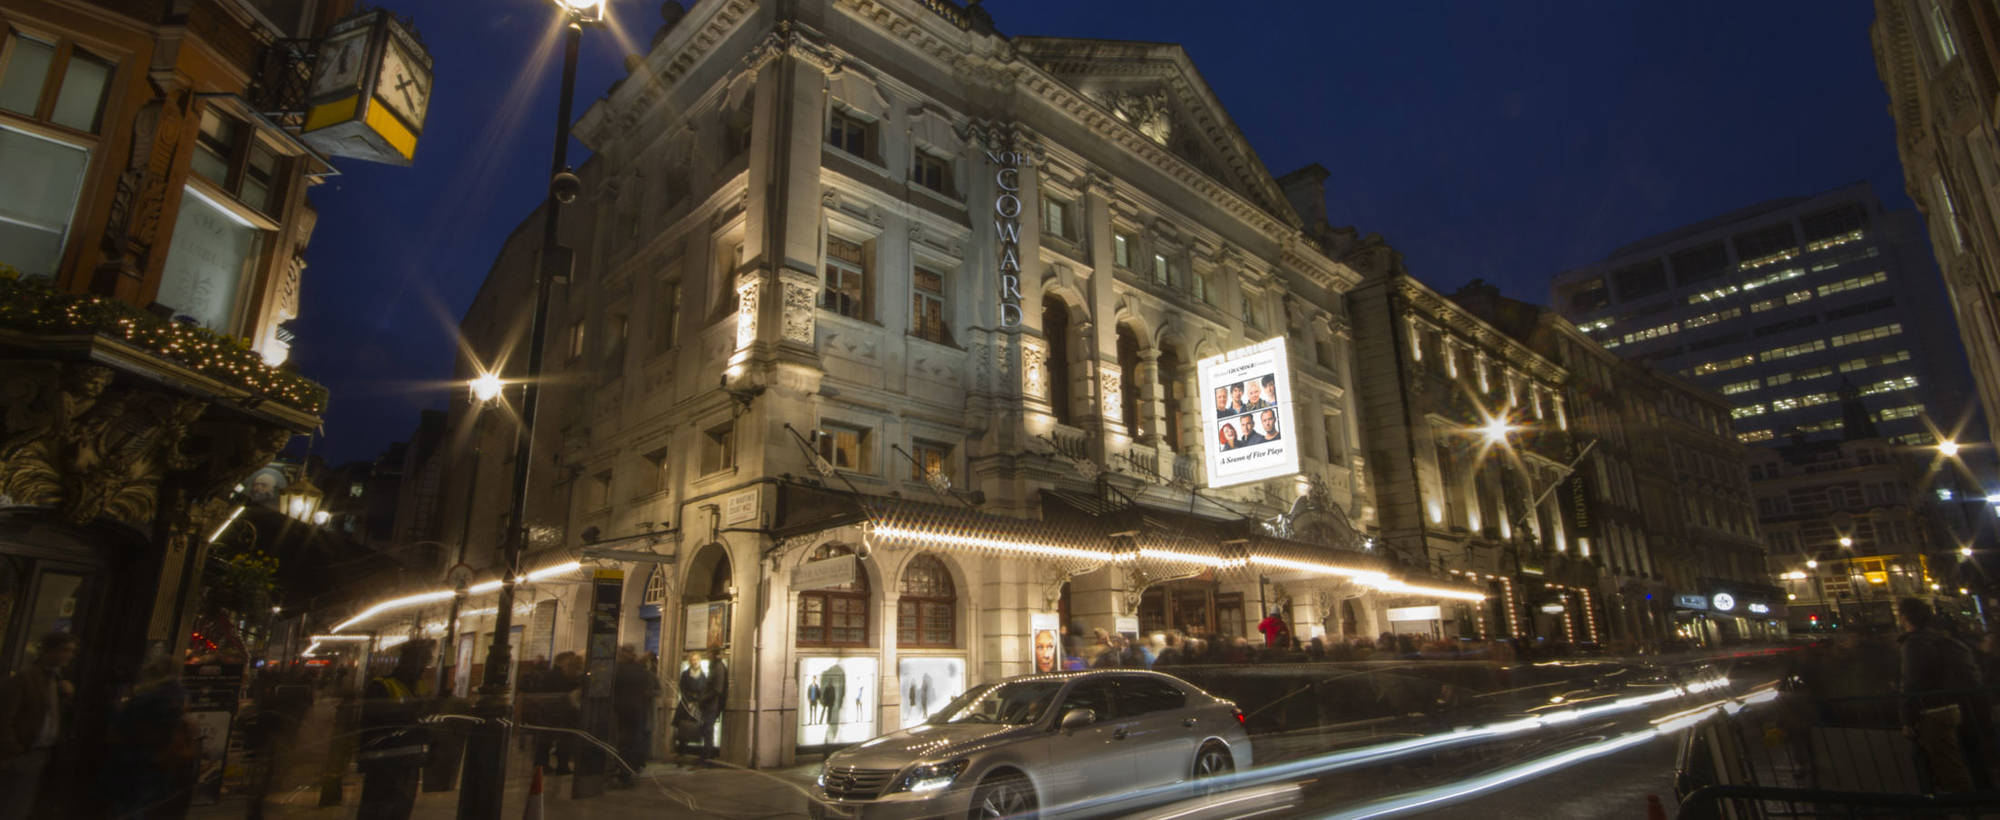 FOH Noel Coward theatre credit Simon Webb